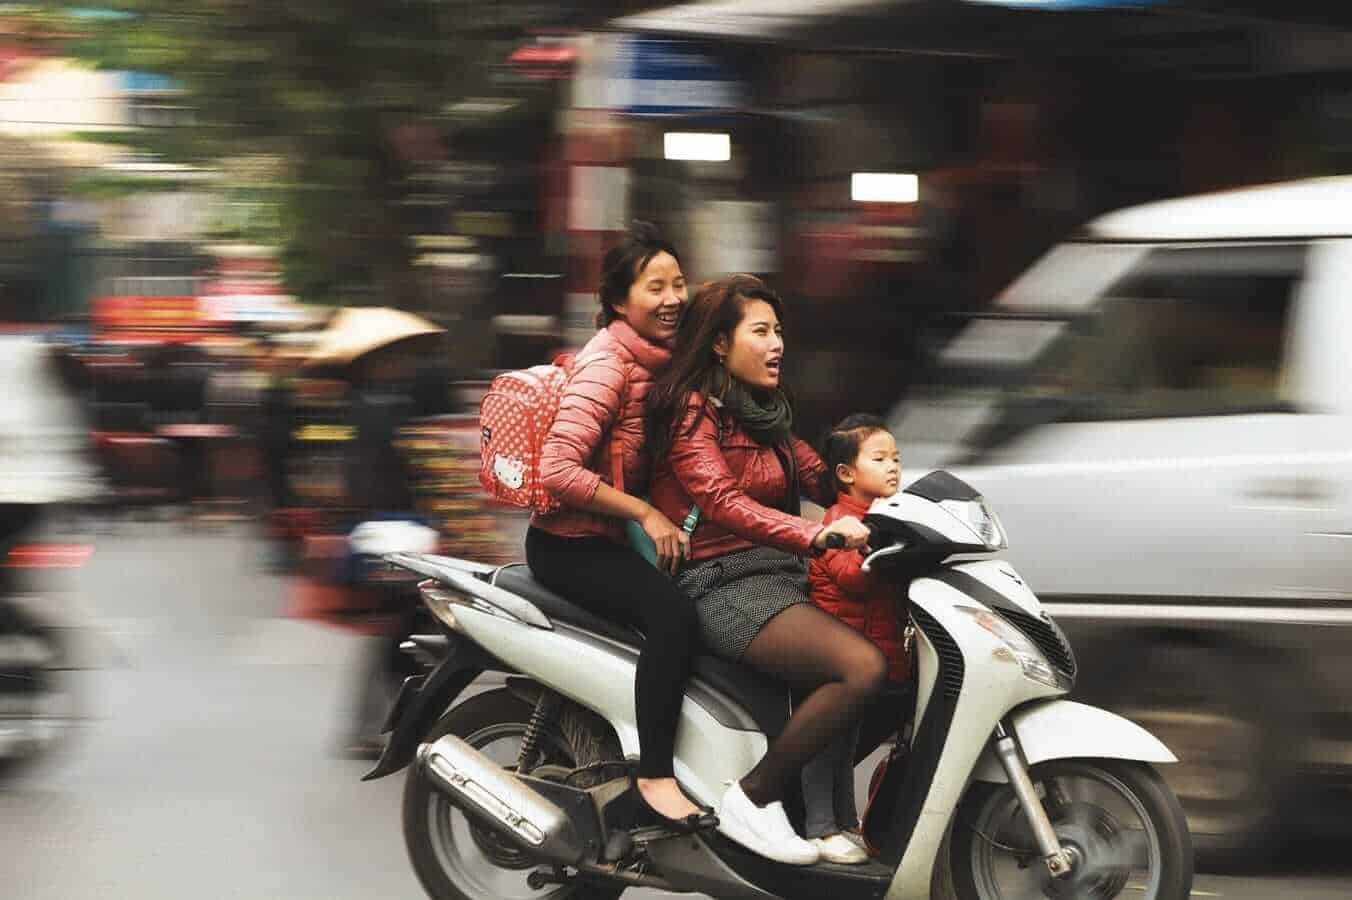 Motor bikes in Hanoi, Vietnam